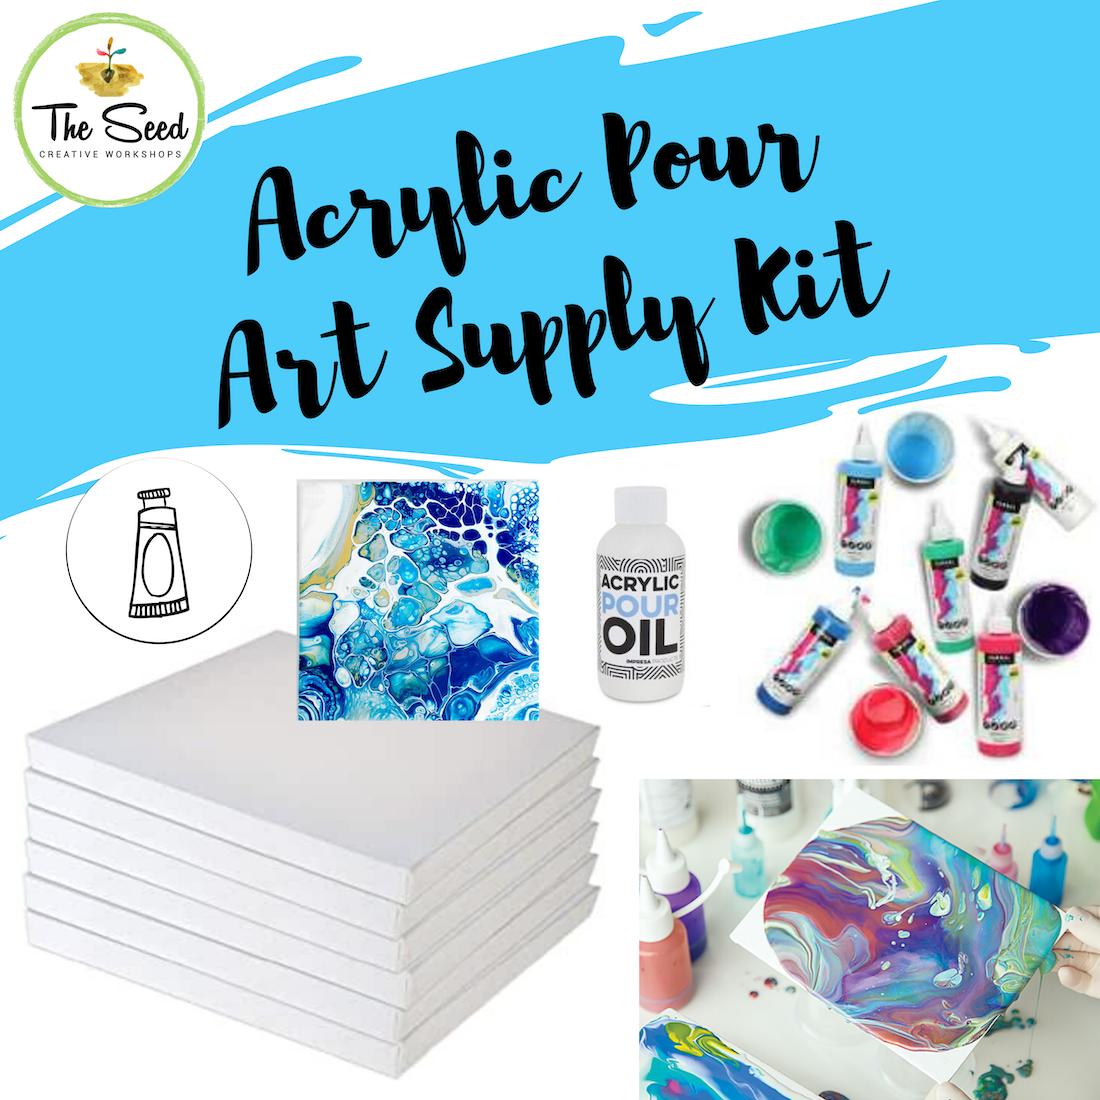 Acrylic Pour Art Supply Kit